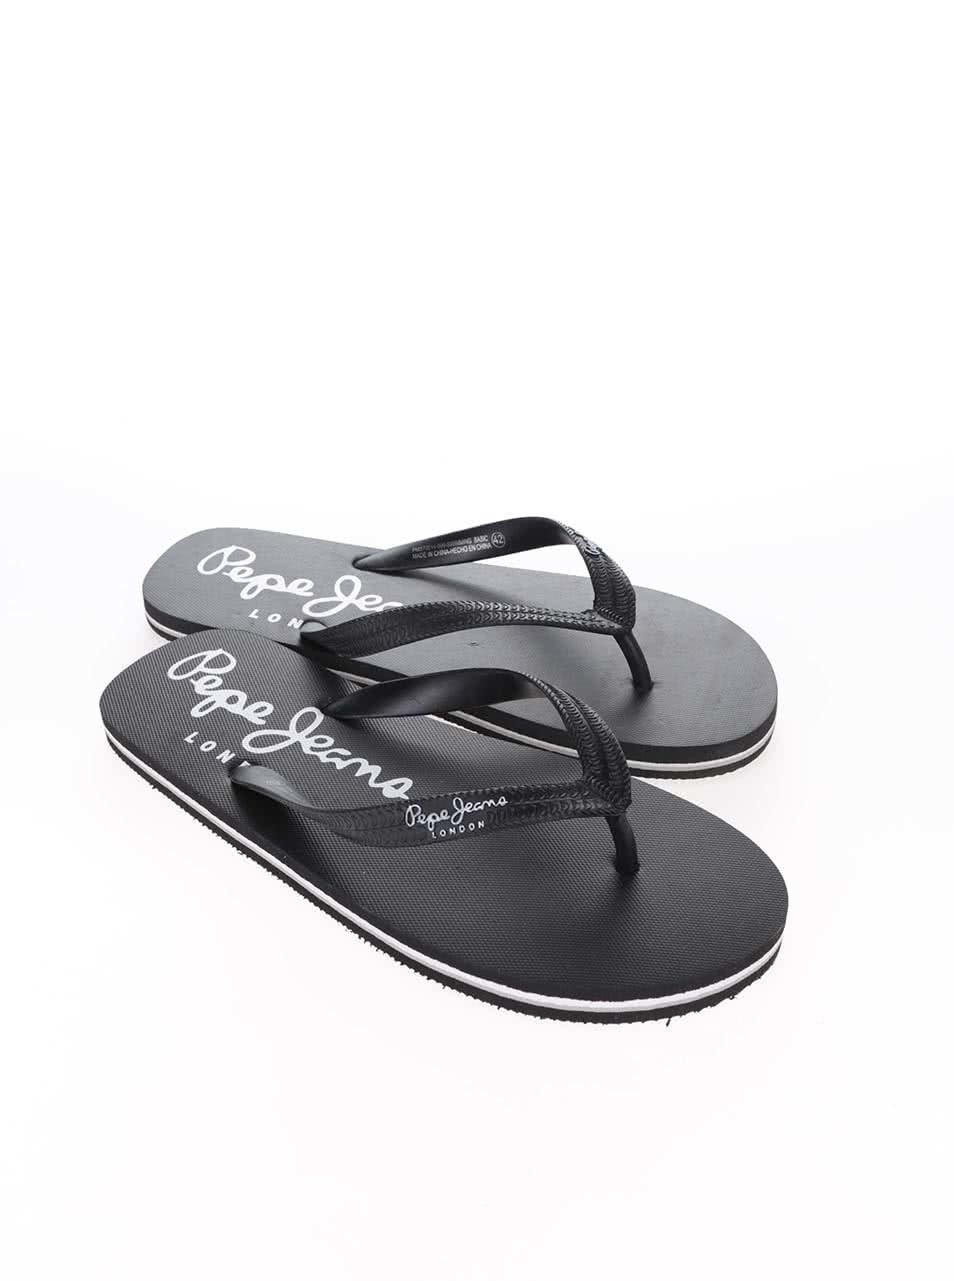 Černé pánské žabky Pepe Jeans Swimming ... 3c5e4ab8c6